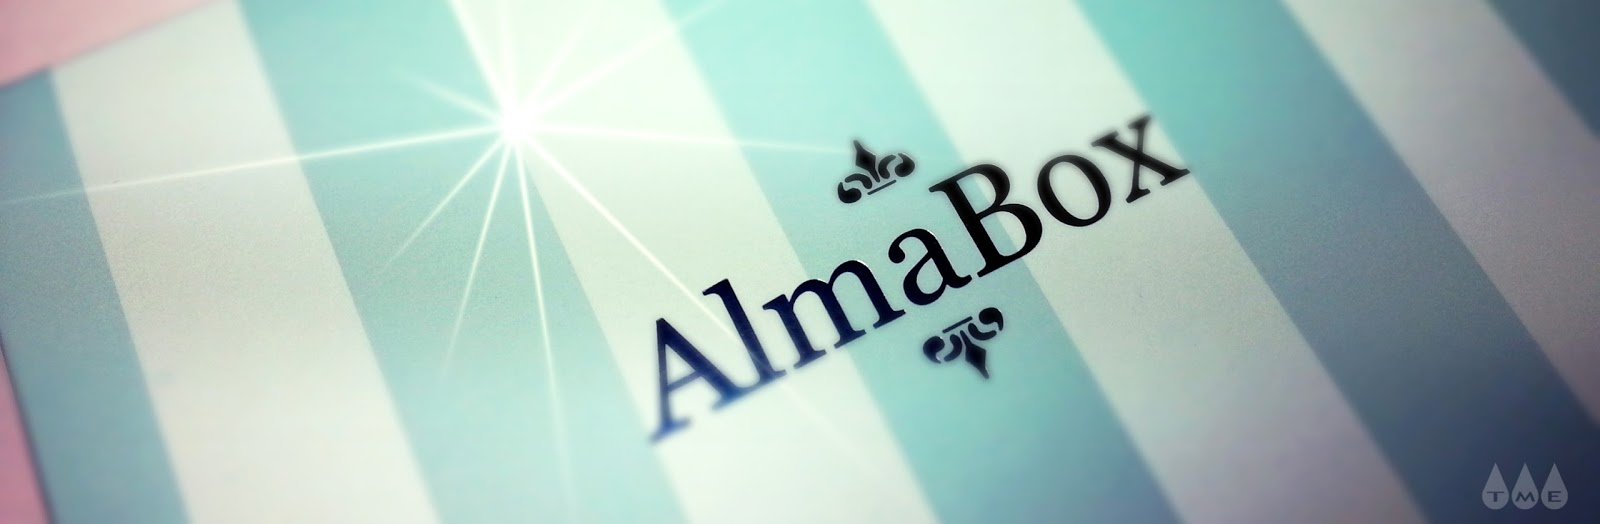 almabox-octubre-2014-ttaamour